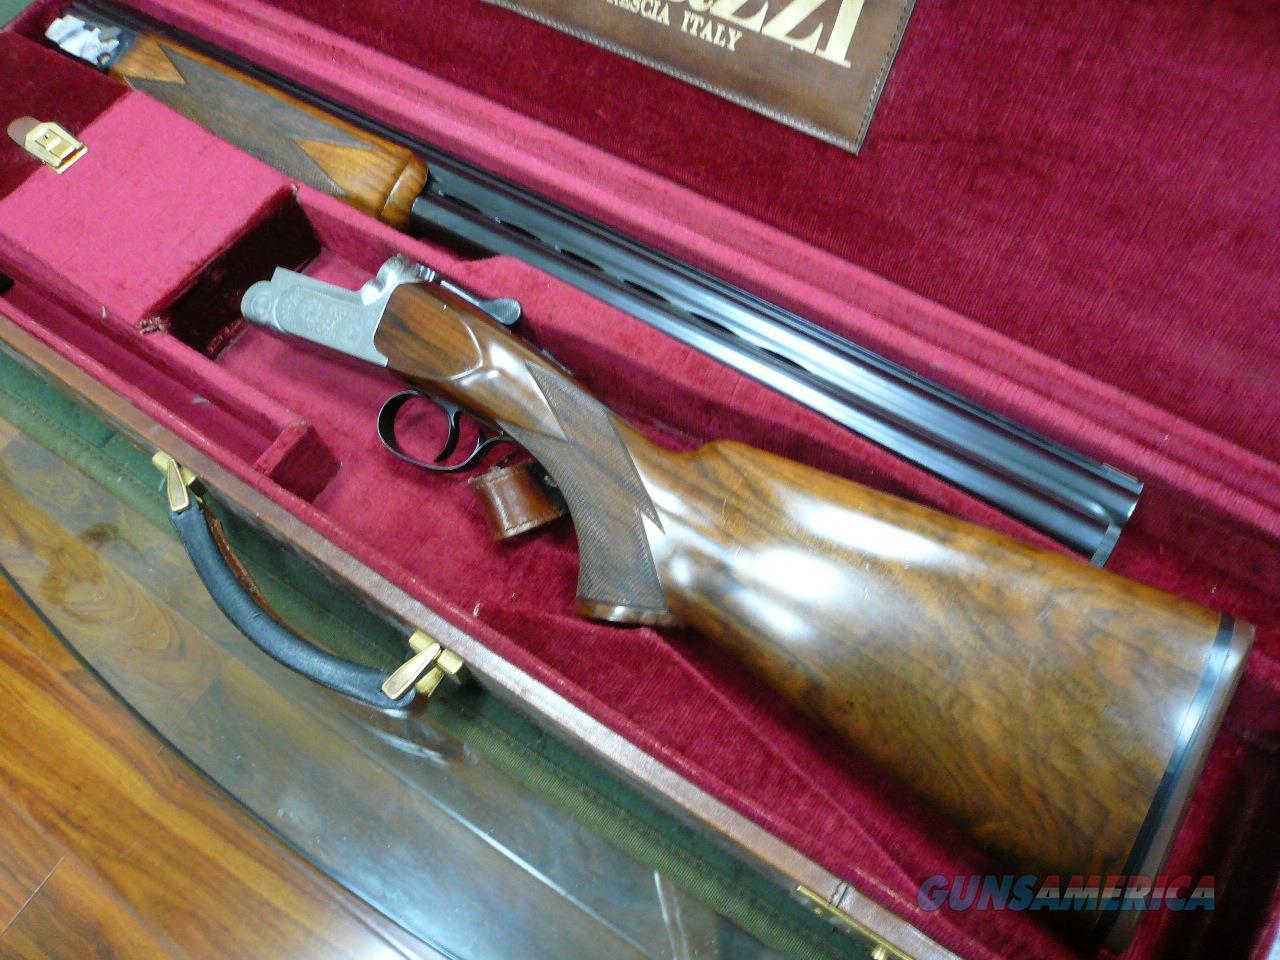 "MX8-SC3 12ga 27 5/8""bbl (hand-thrown bird)  Guns > Shotguns > Perazzi Shotguns"